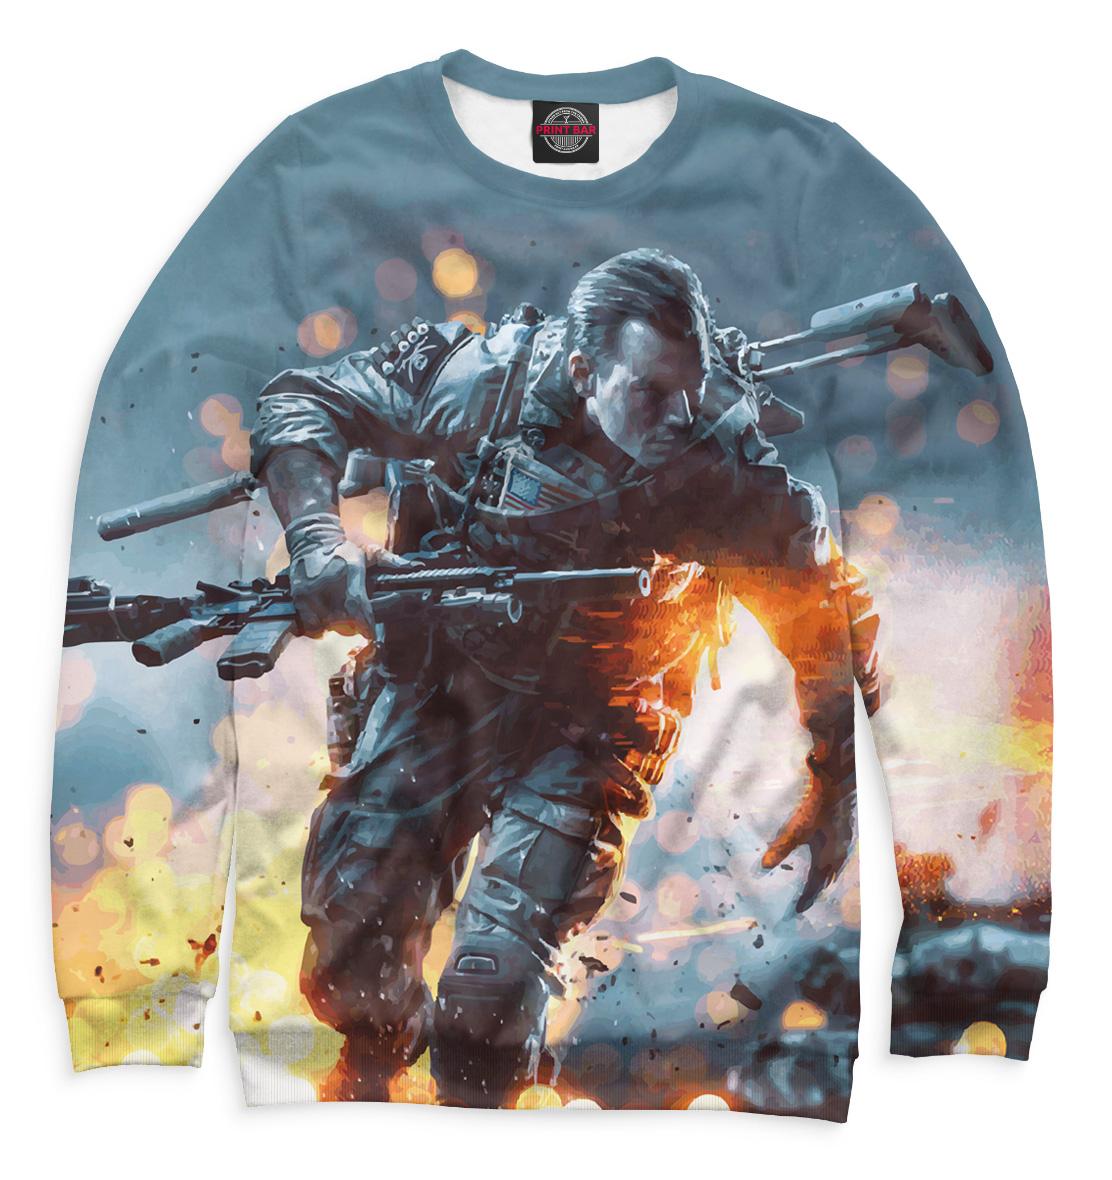 Купить Battlefield 4, Printbar, Свитшоты, BTF-983815-swi-1